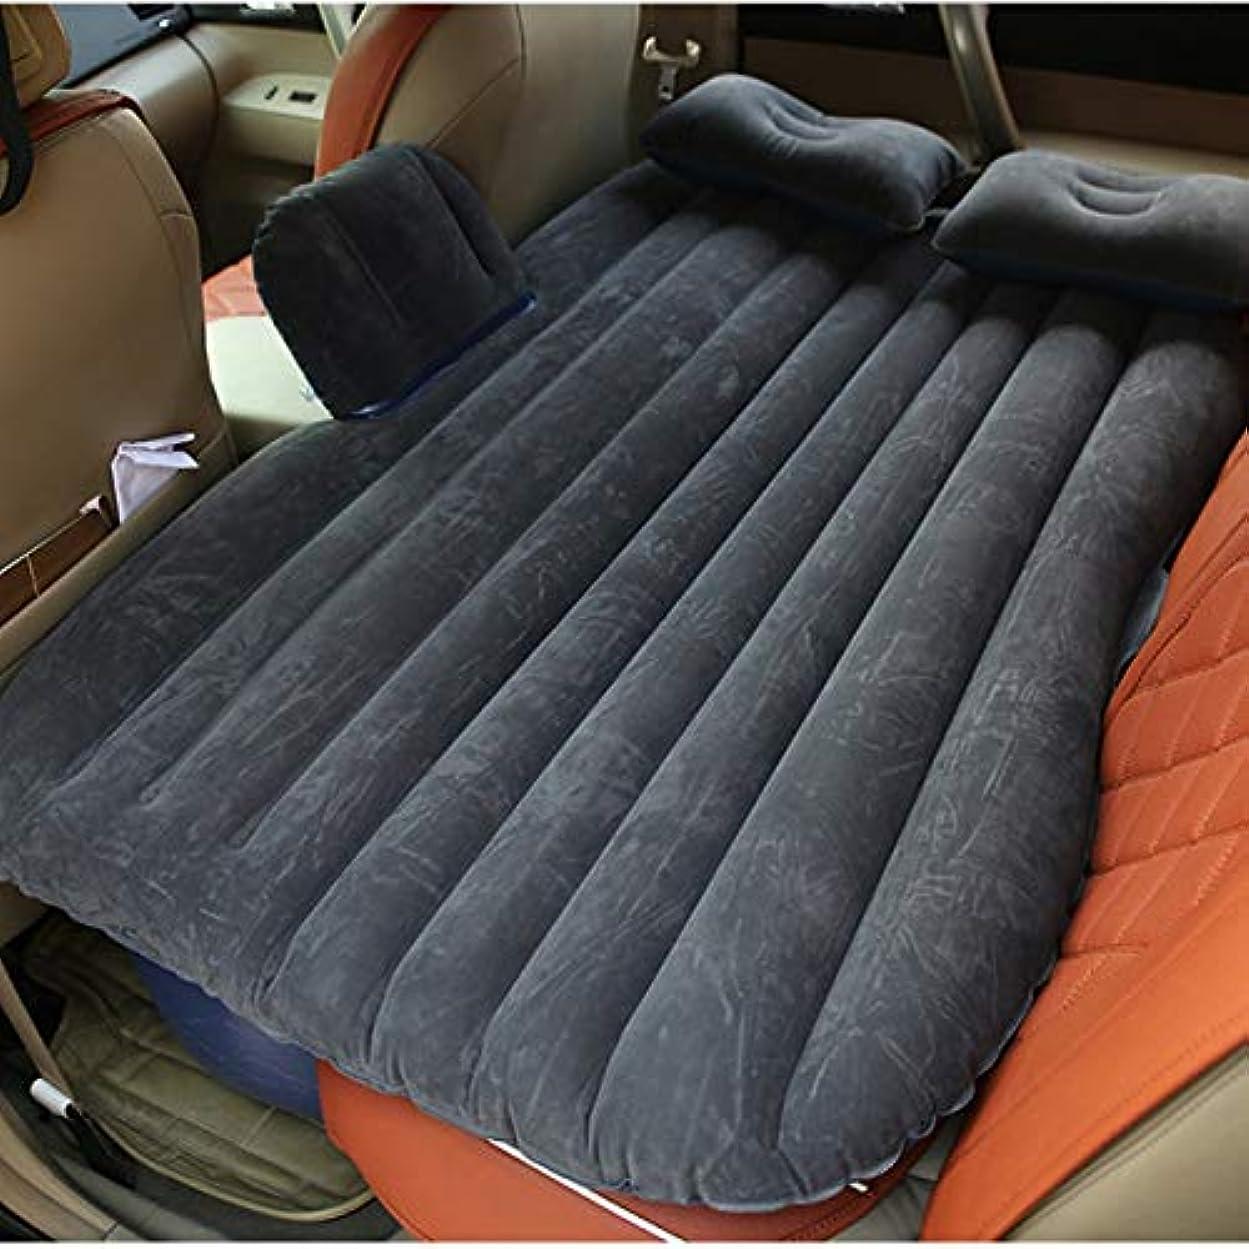 Saikogoods 車内用大型耐久性に優れたカーバックシートカバーカーエアマットレス旅行ベッド防湿インフレータブルマットレスエアーベッド 黒